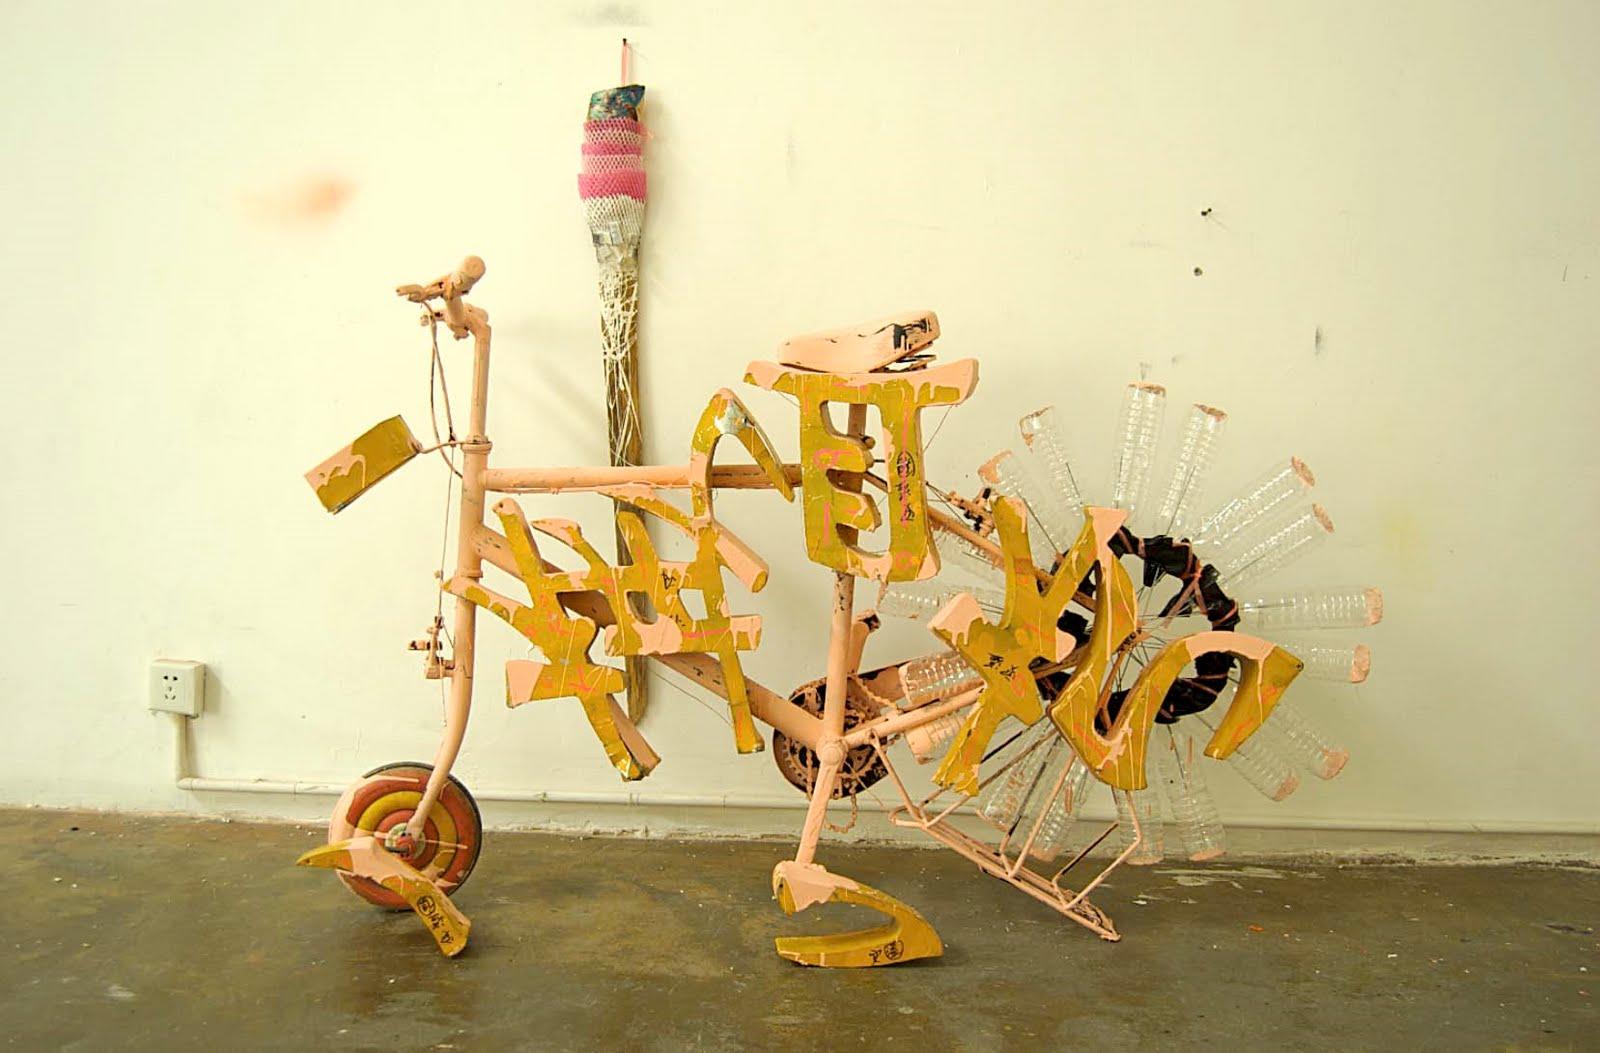 [chinese+bike+to+freedom]